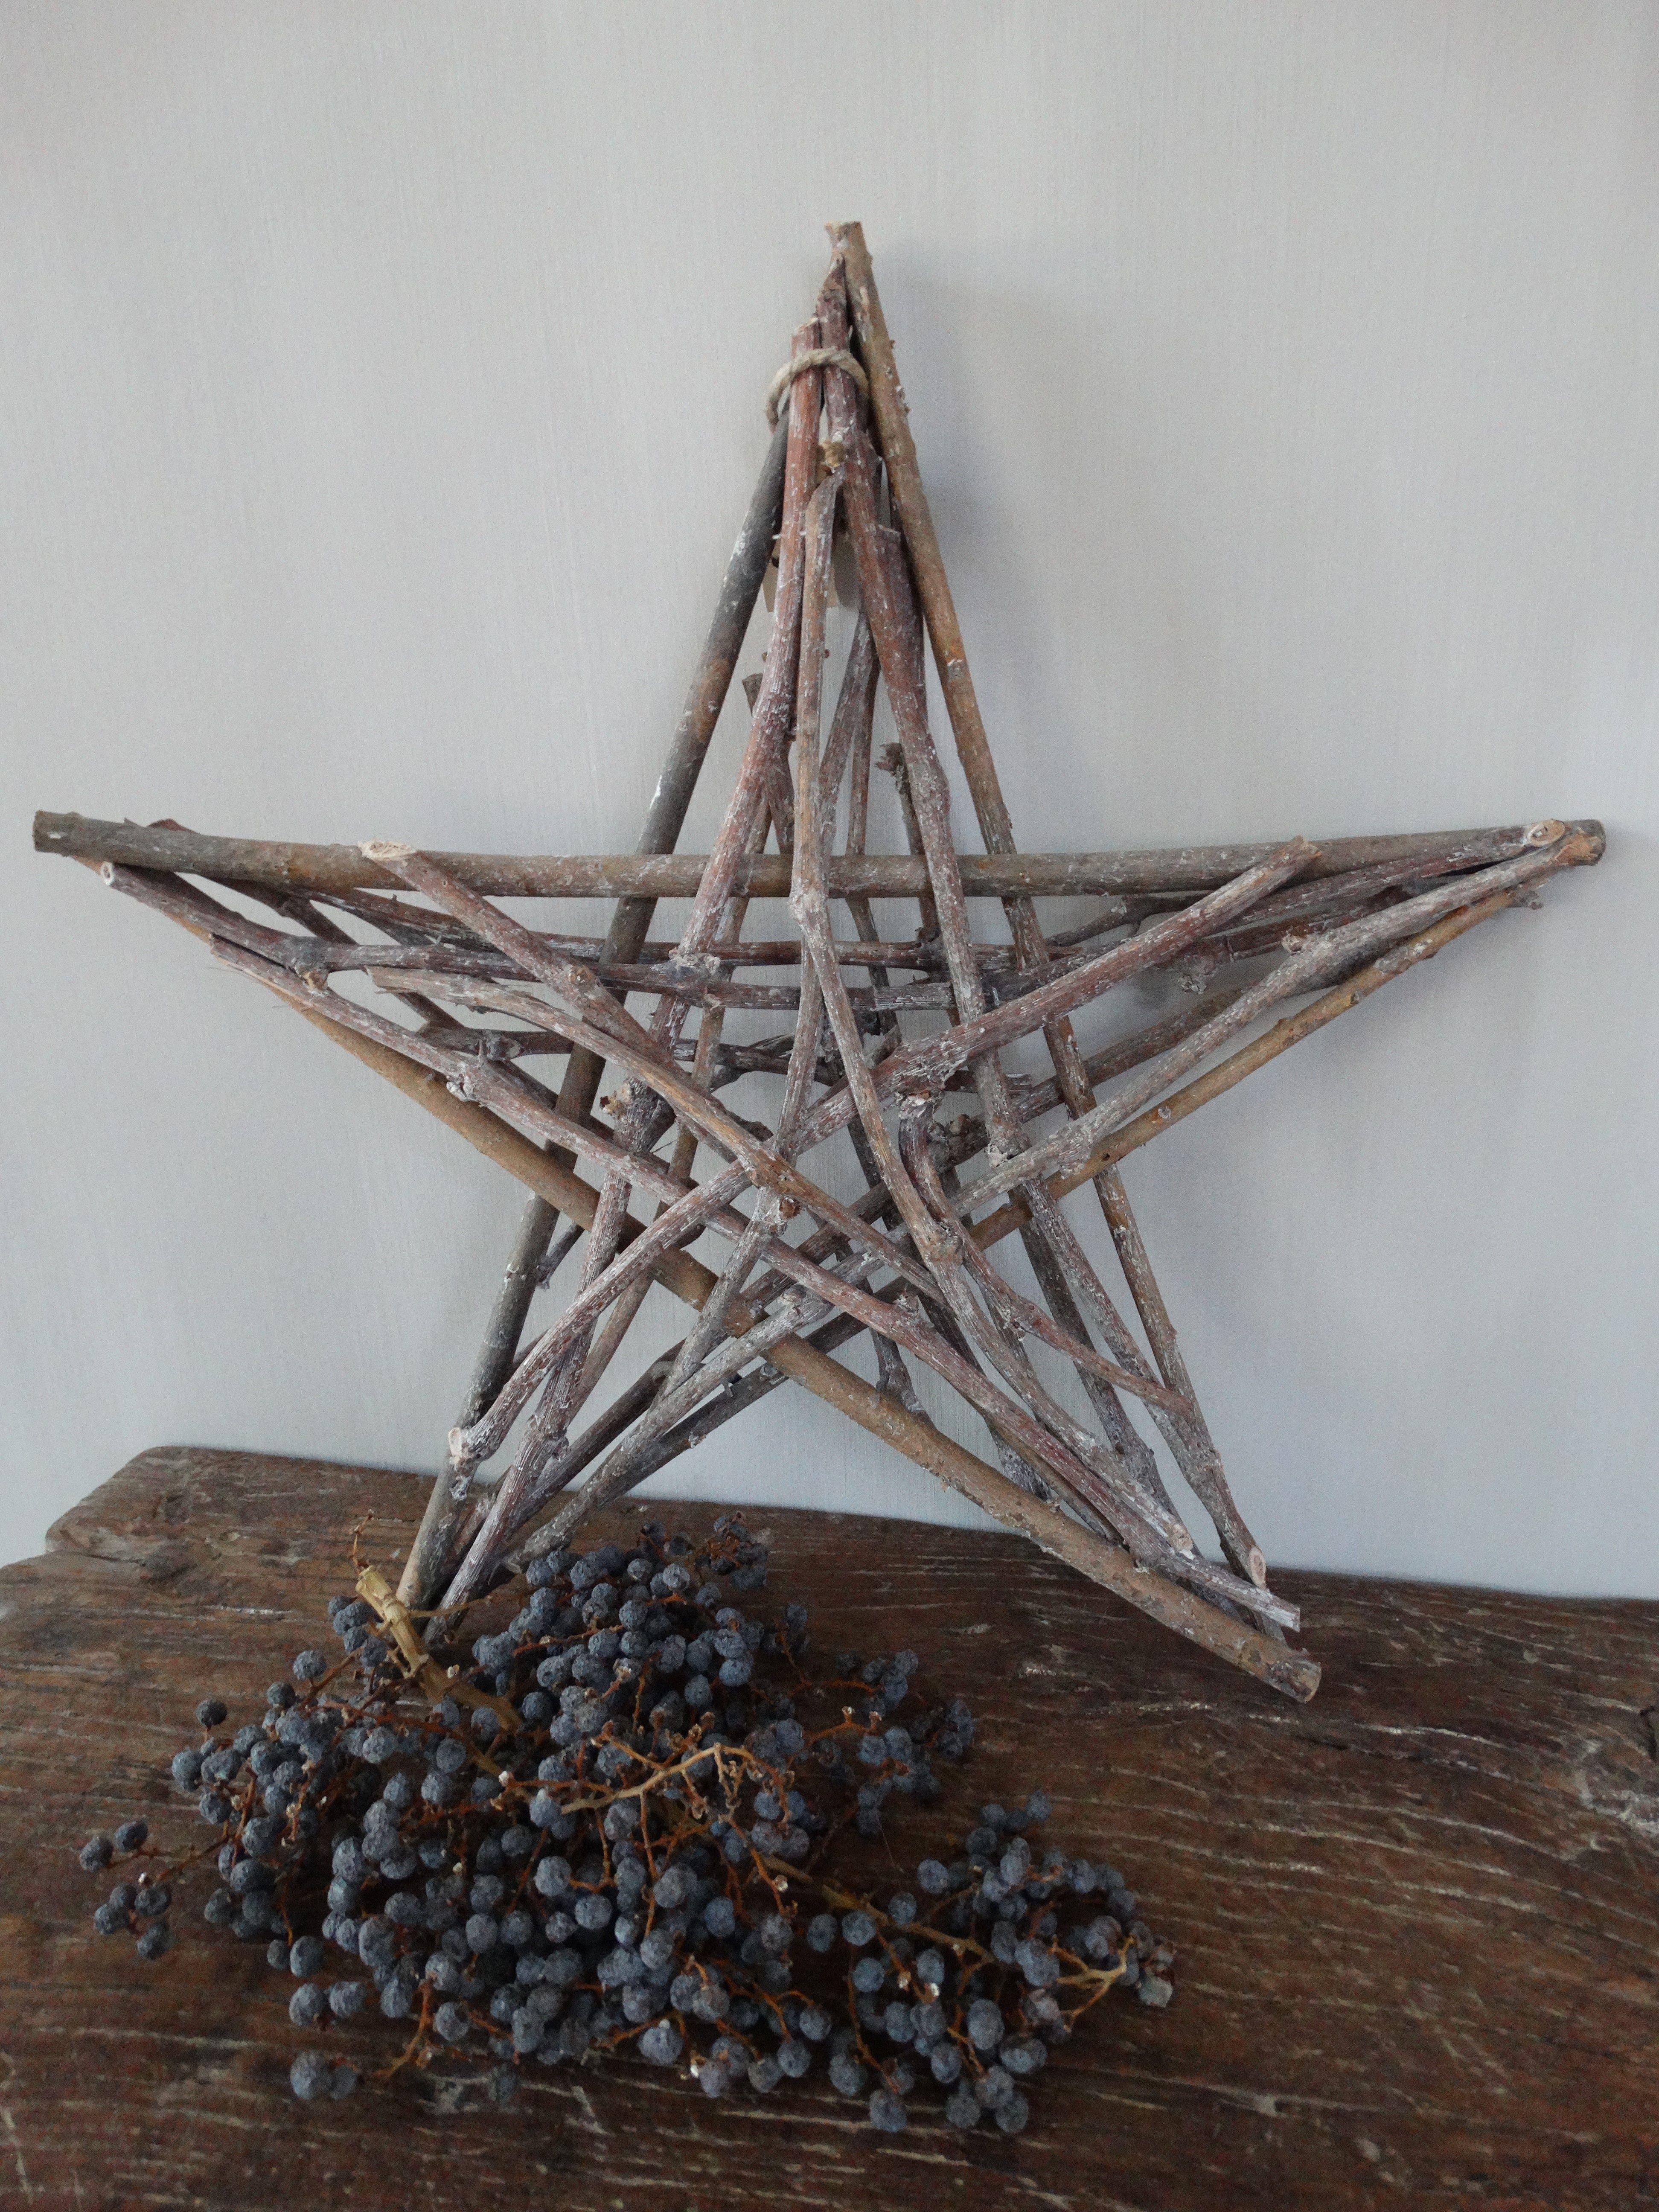 Kerst Decoratie Ster Van Takken Kerst Houtbewerking Ouderwetse Kerstornamenten Kerst